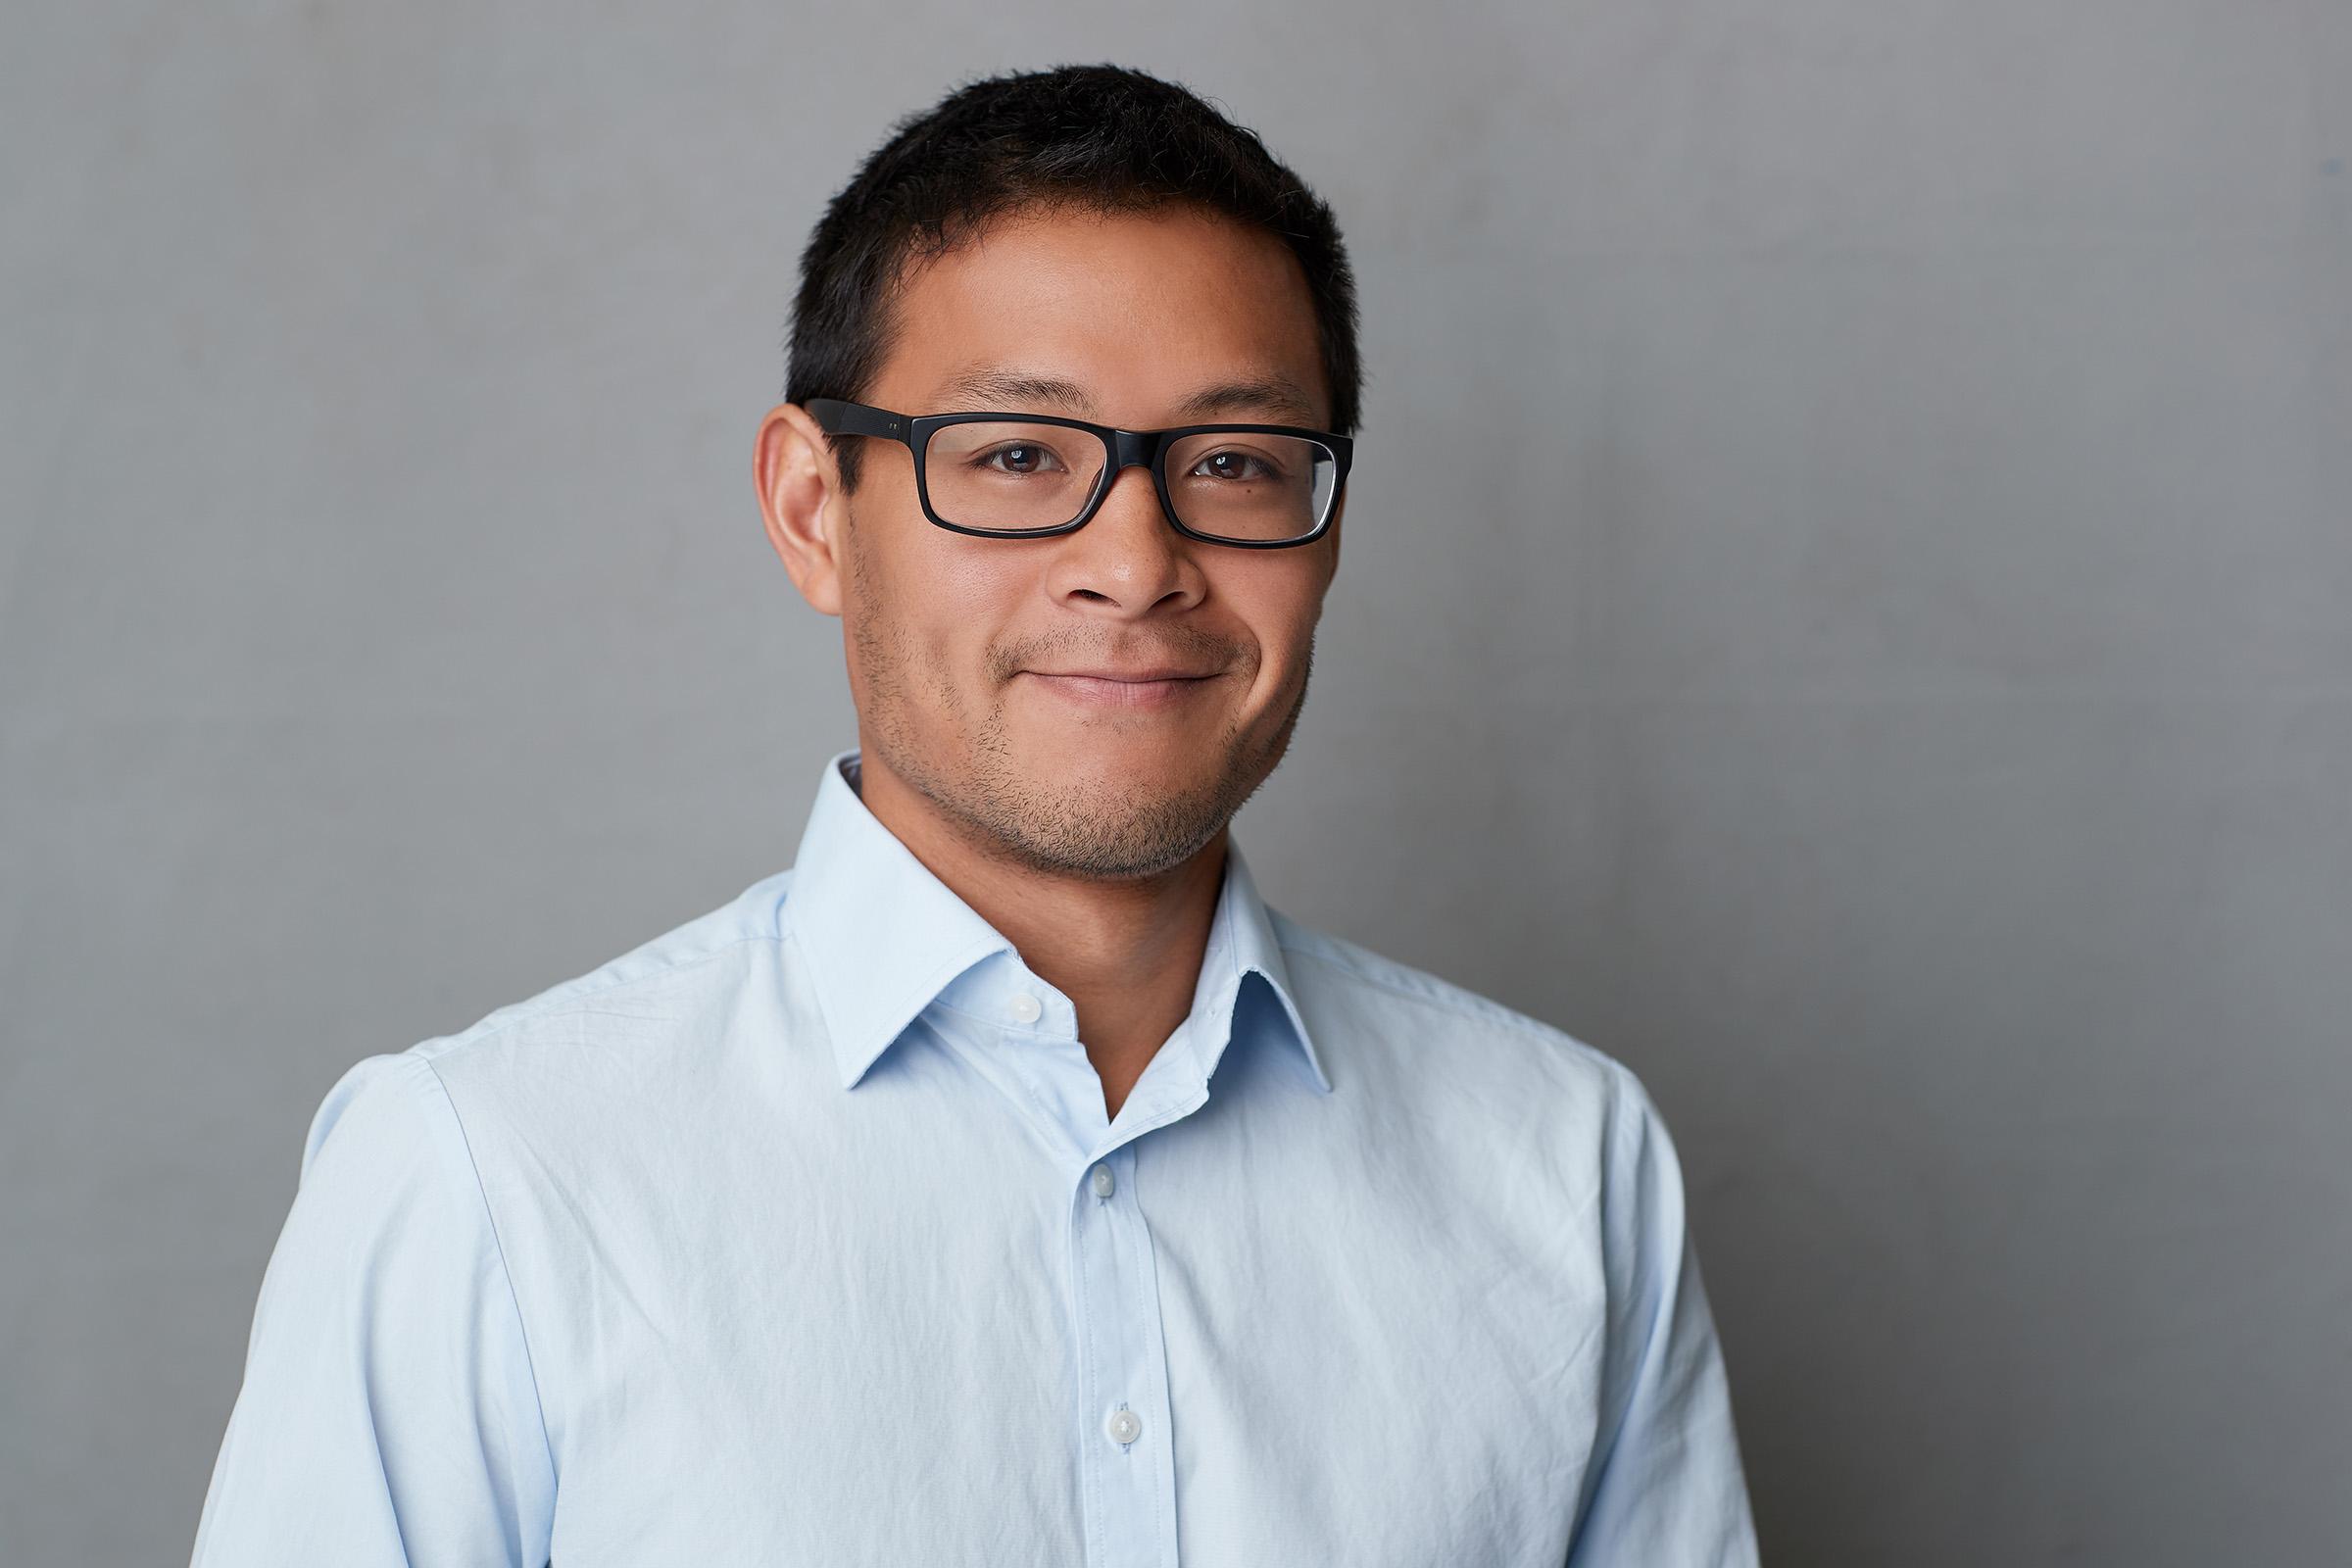 Matt Butawan